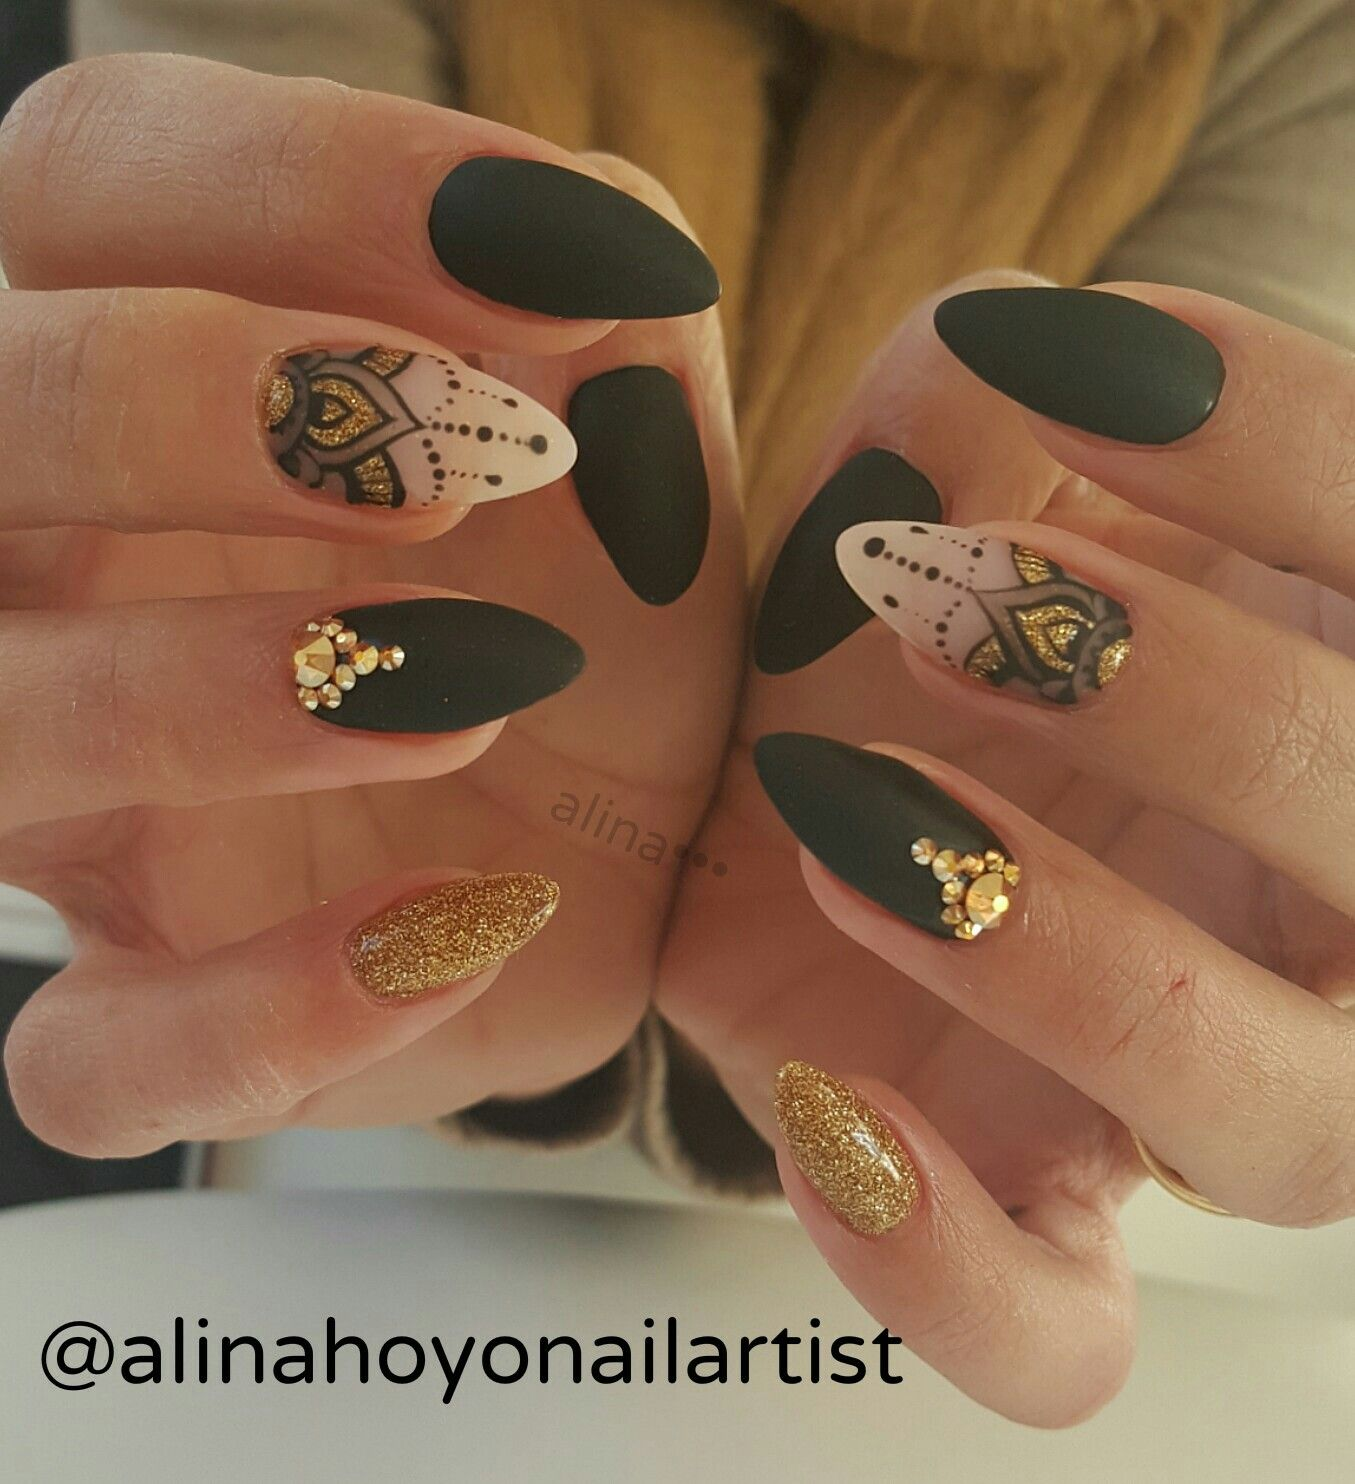 Pin de Alina Hoyo en nails | Pinterest | Diseños de uñas, Arte de ...